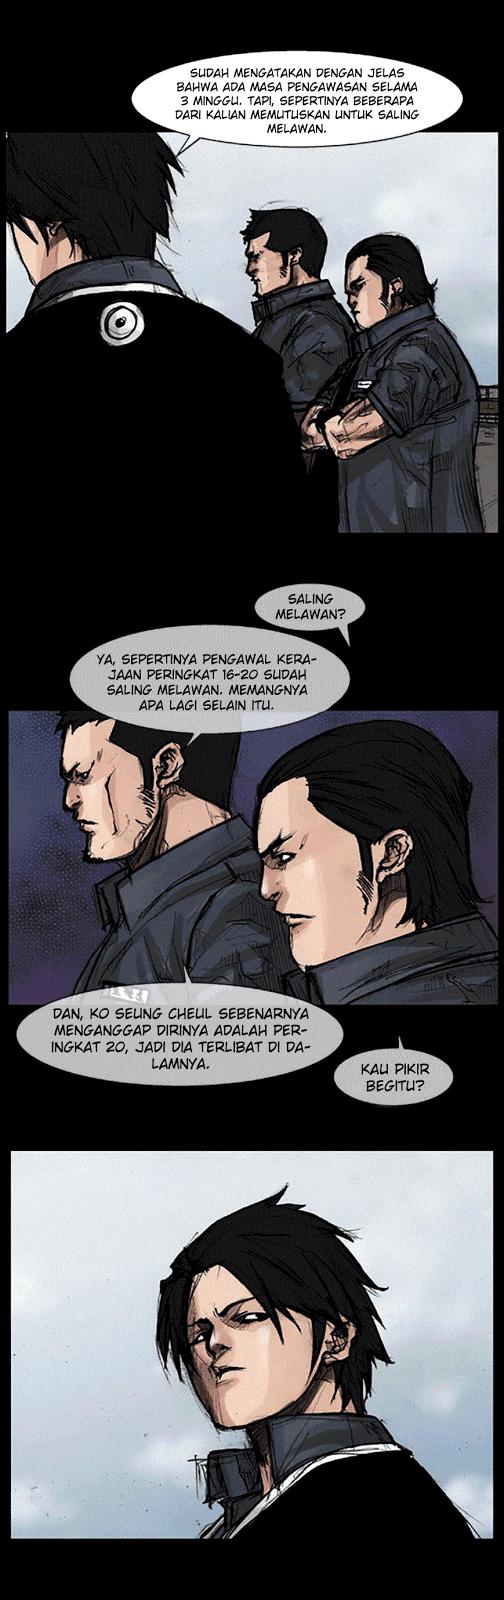 Komik dokgo 041 - chapter 41 42 Indonesia dokgo 041 - chapter 41 Terbaru 12|Baca Manga Komik Indonesia